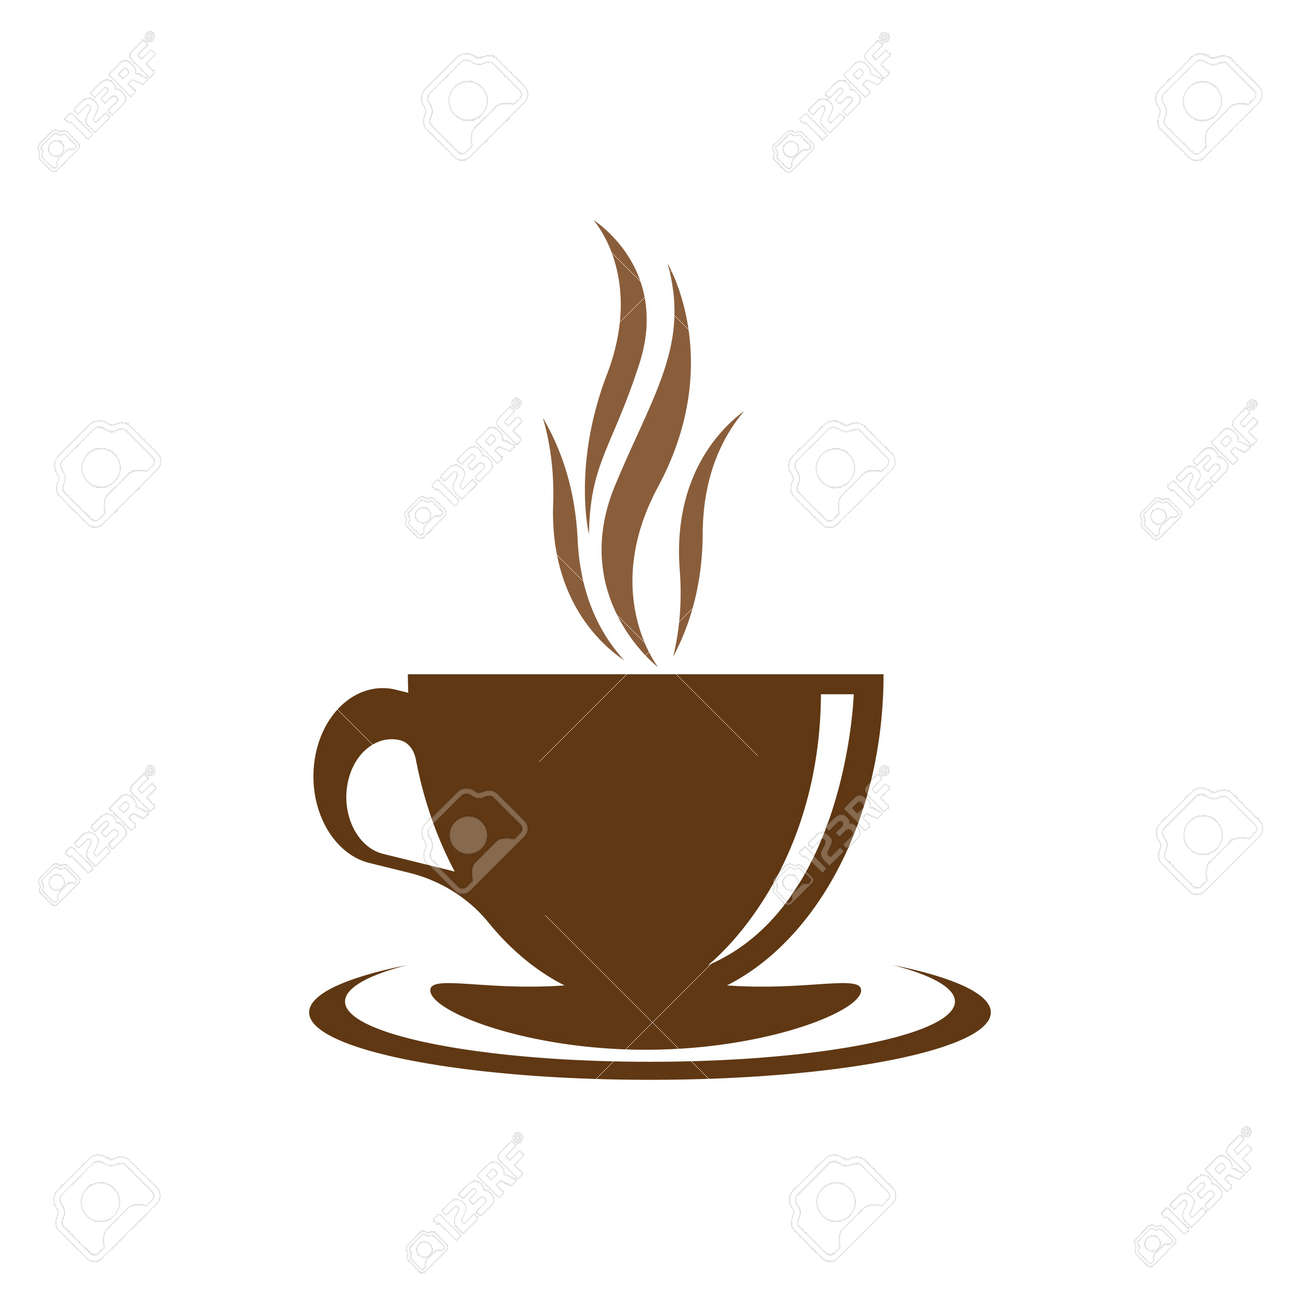 Coffee cup logo images illustration design - 173289062